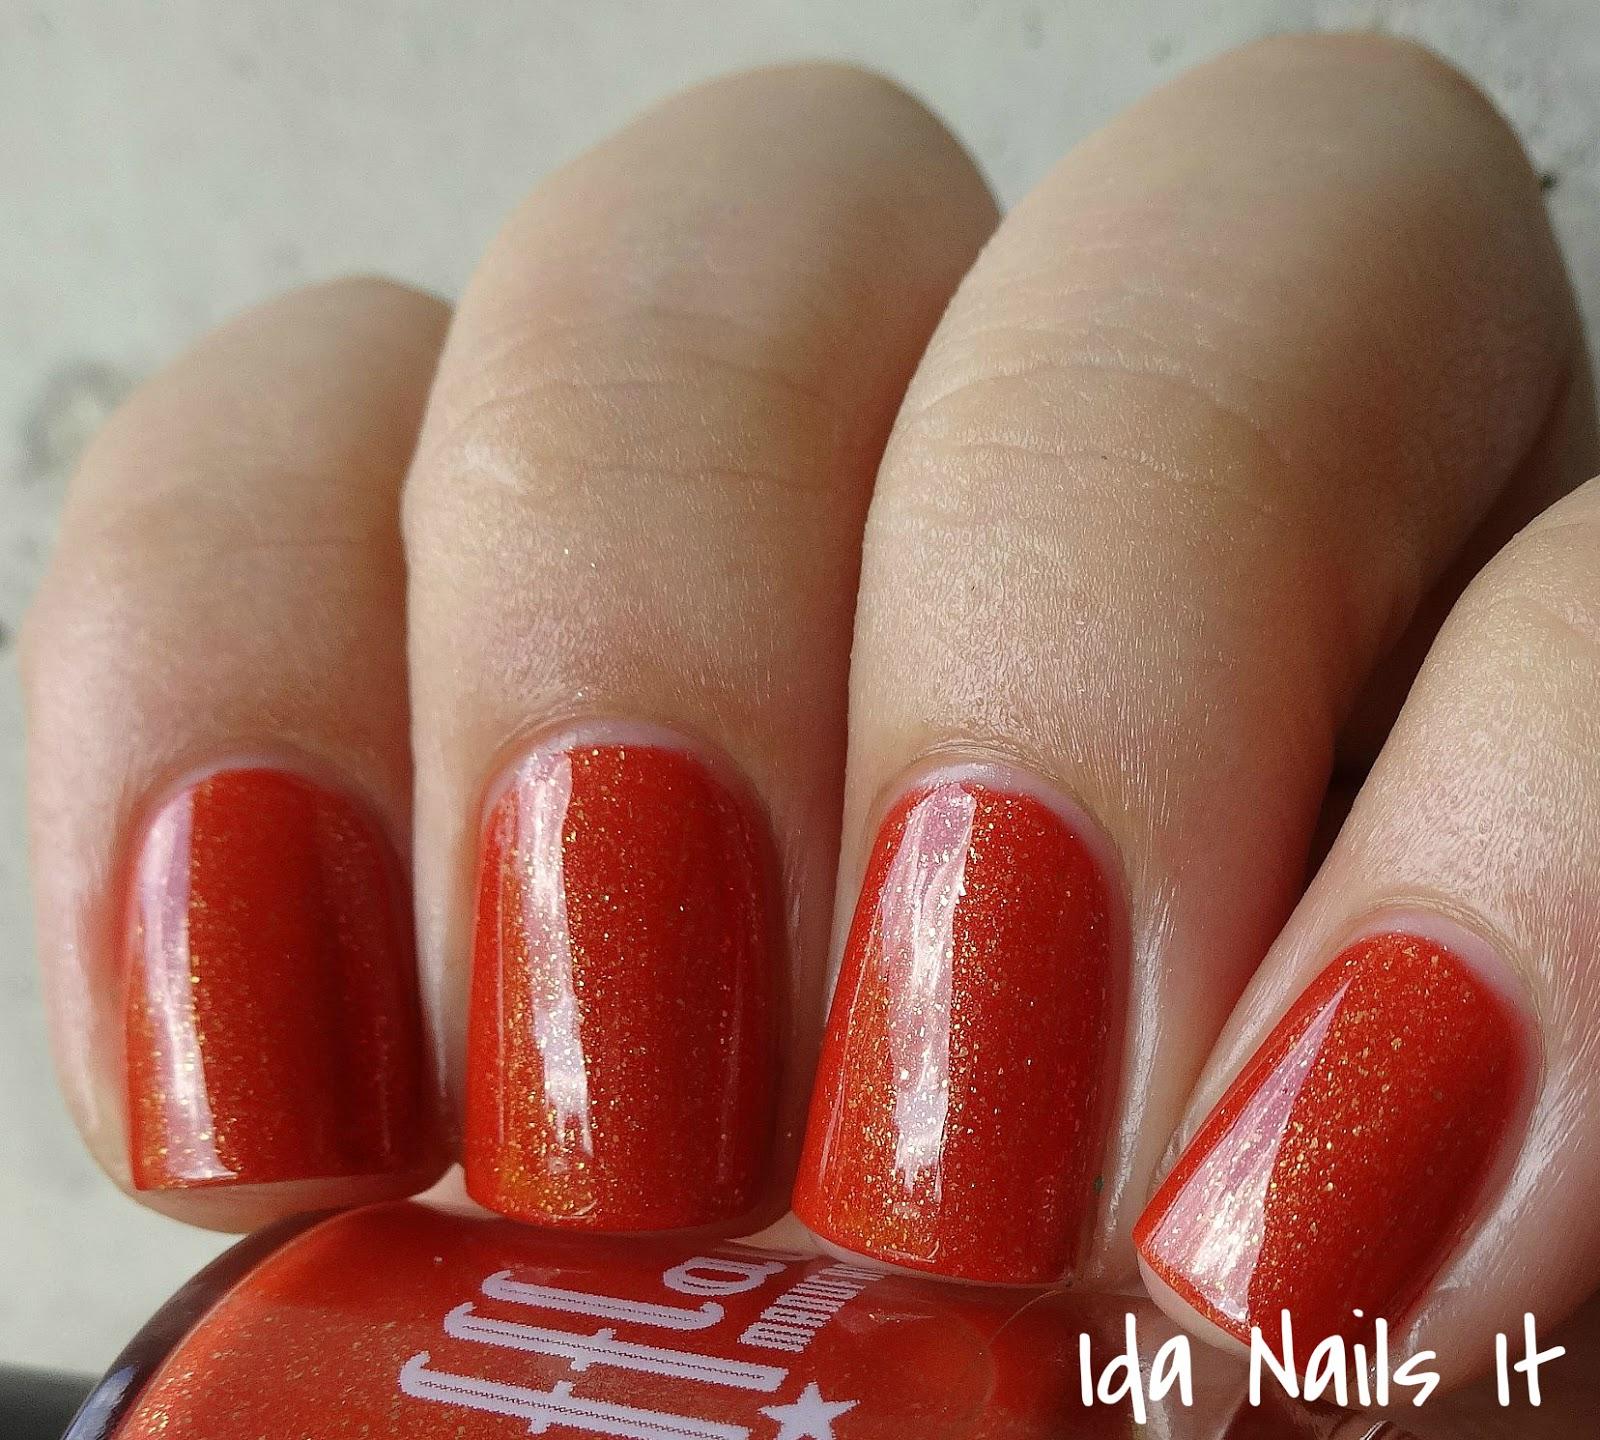 Ida Nails It: Scofflaw Nail Varnish Fall/Autumn 2015 Collection ...